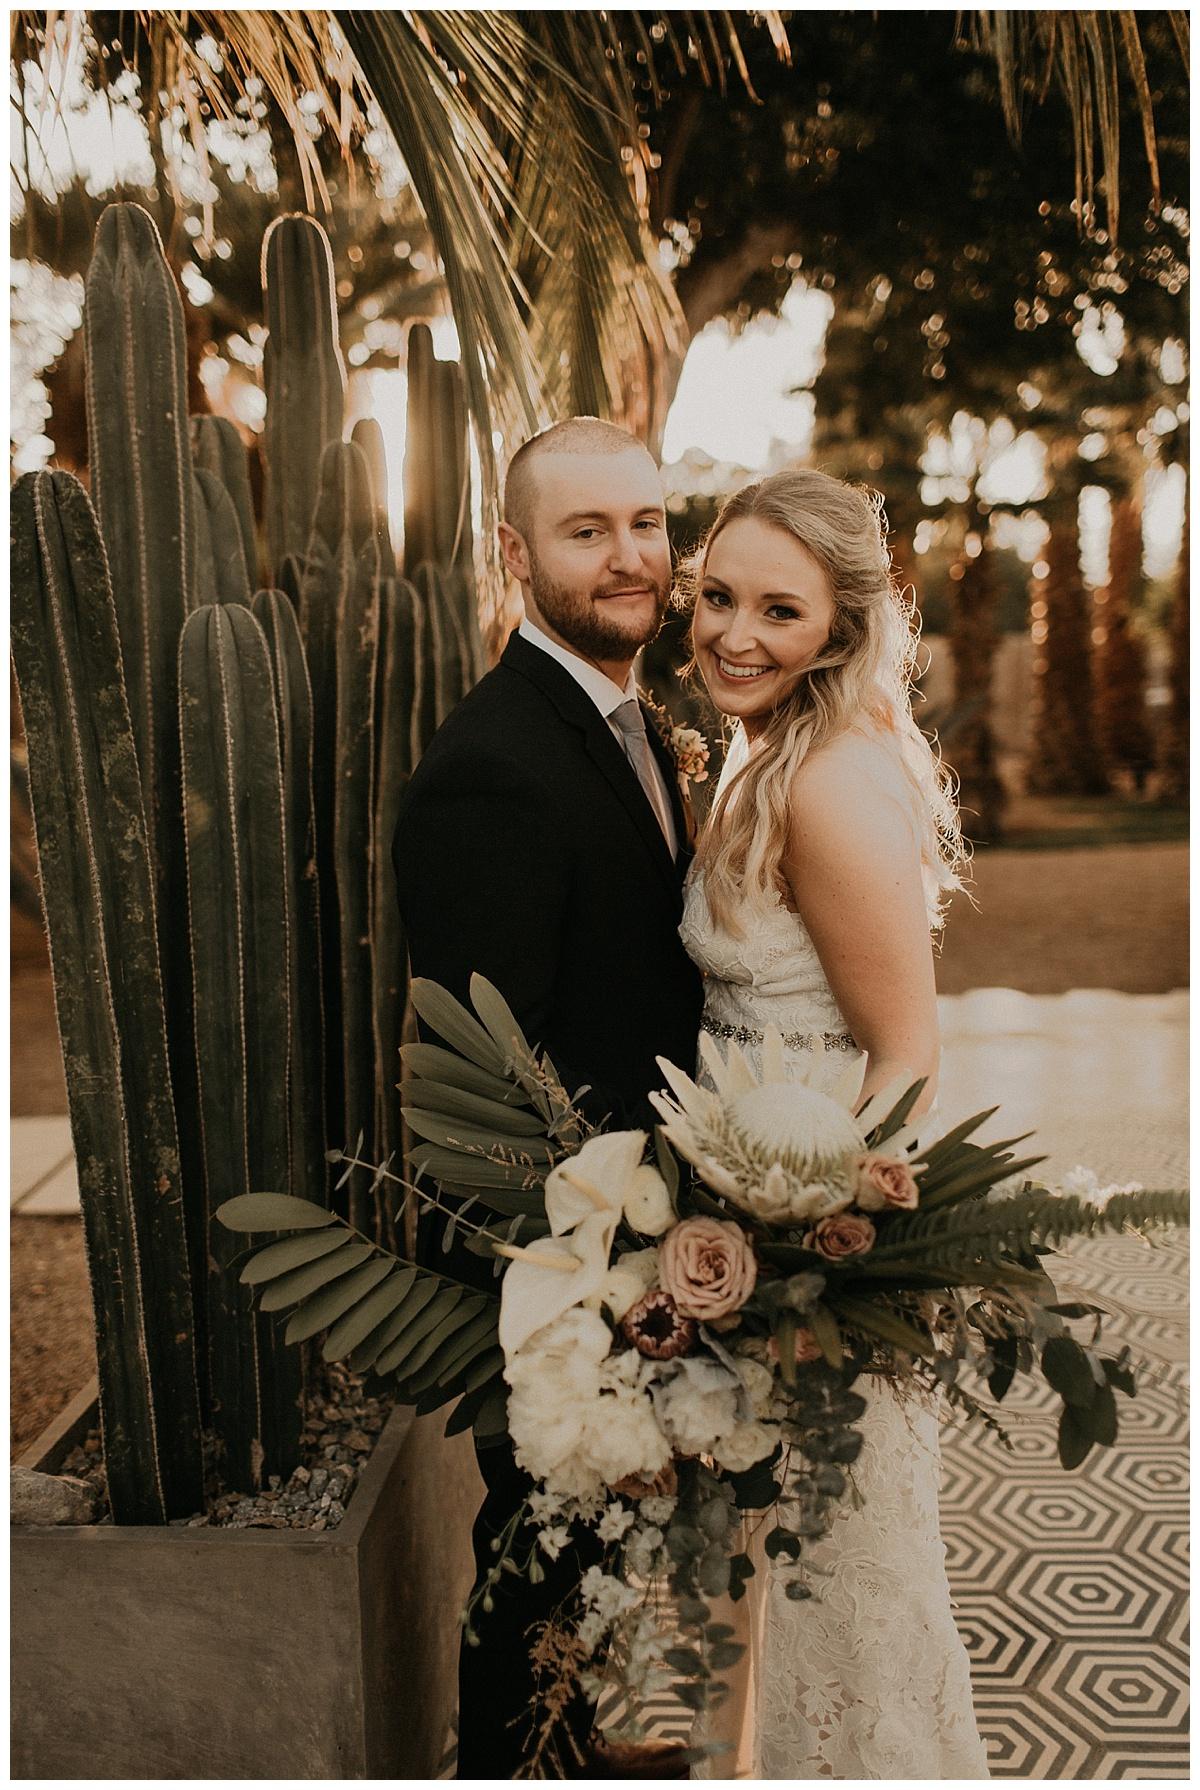 Bixby+Pine-PNW-Wedding-Planners-And-Designers_1788.jpg